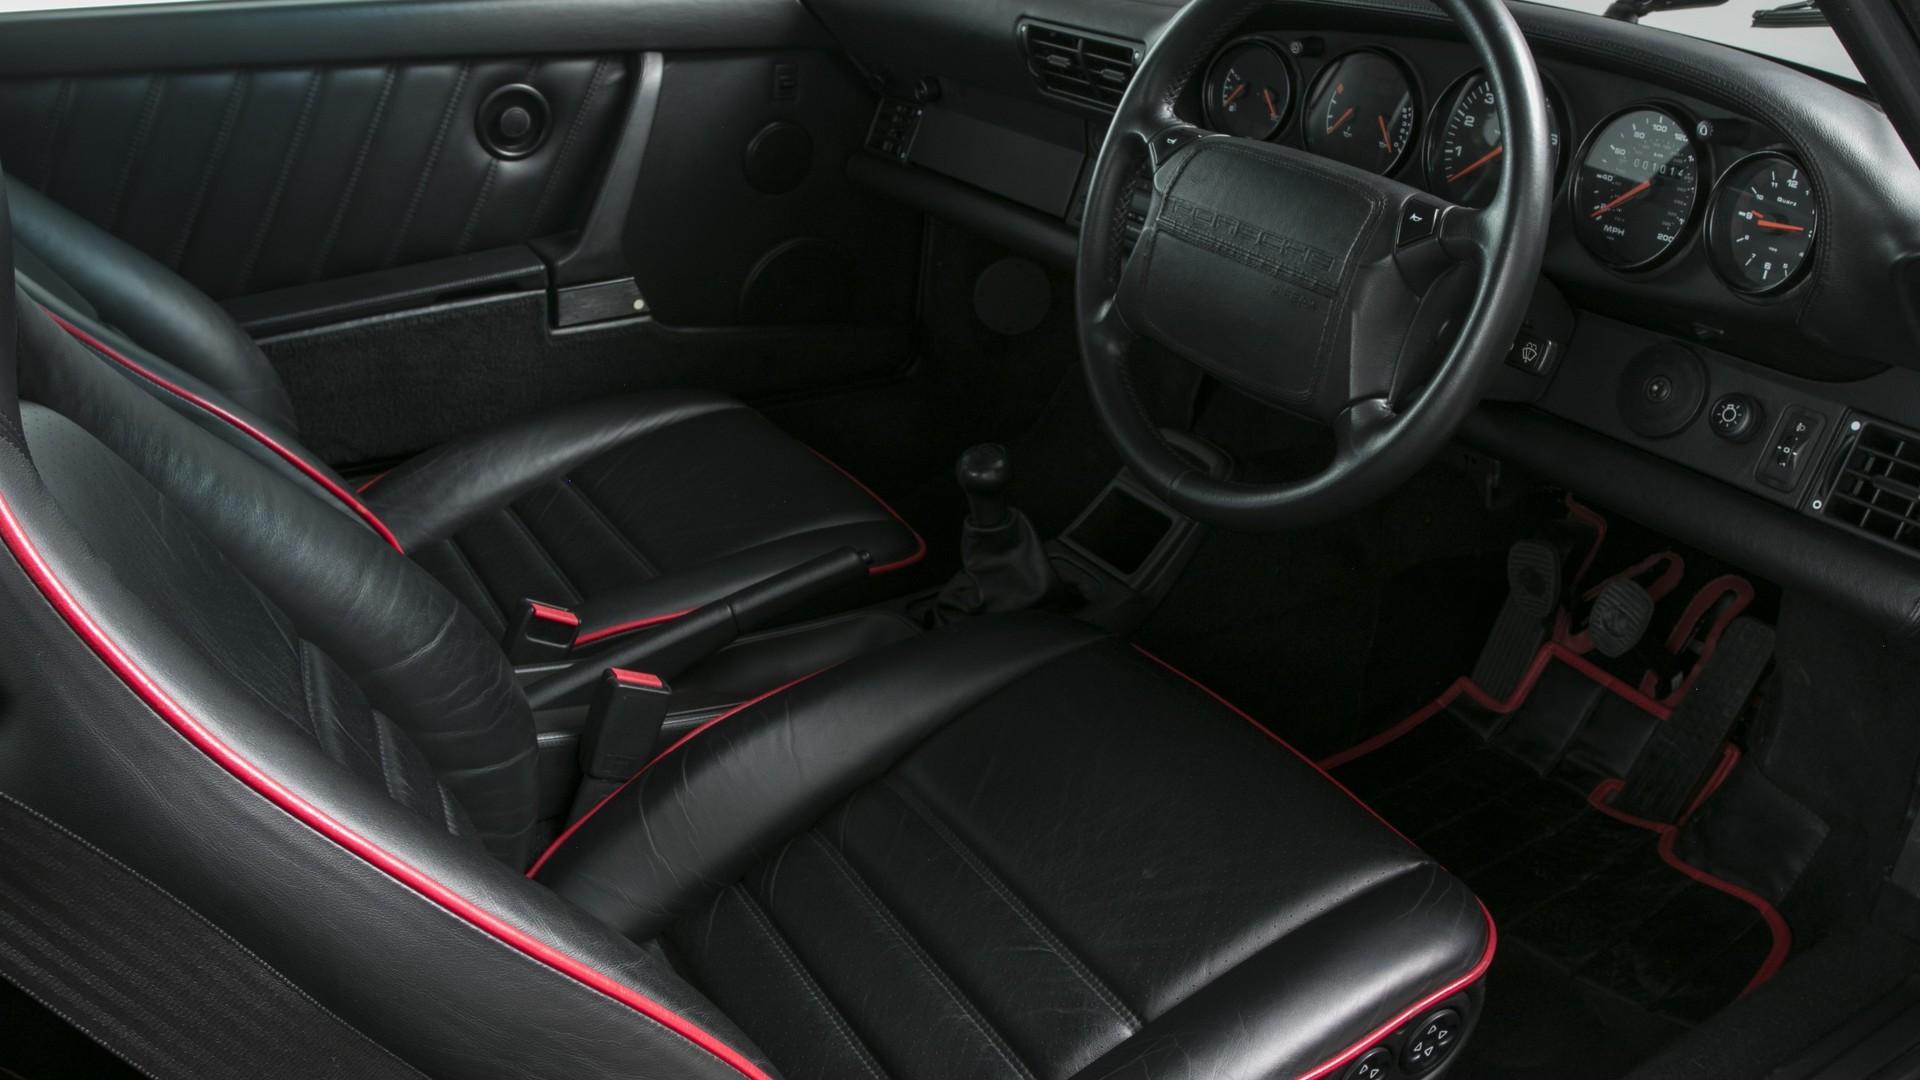 Porsche 964 Turbo Slantnose